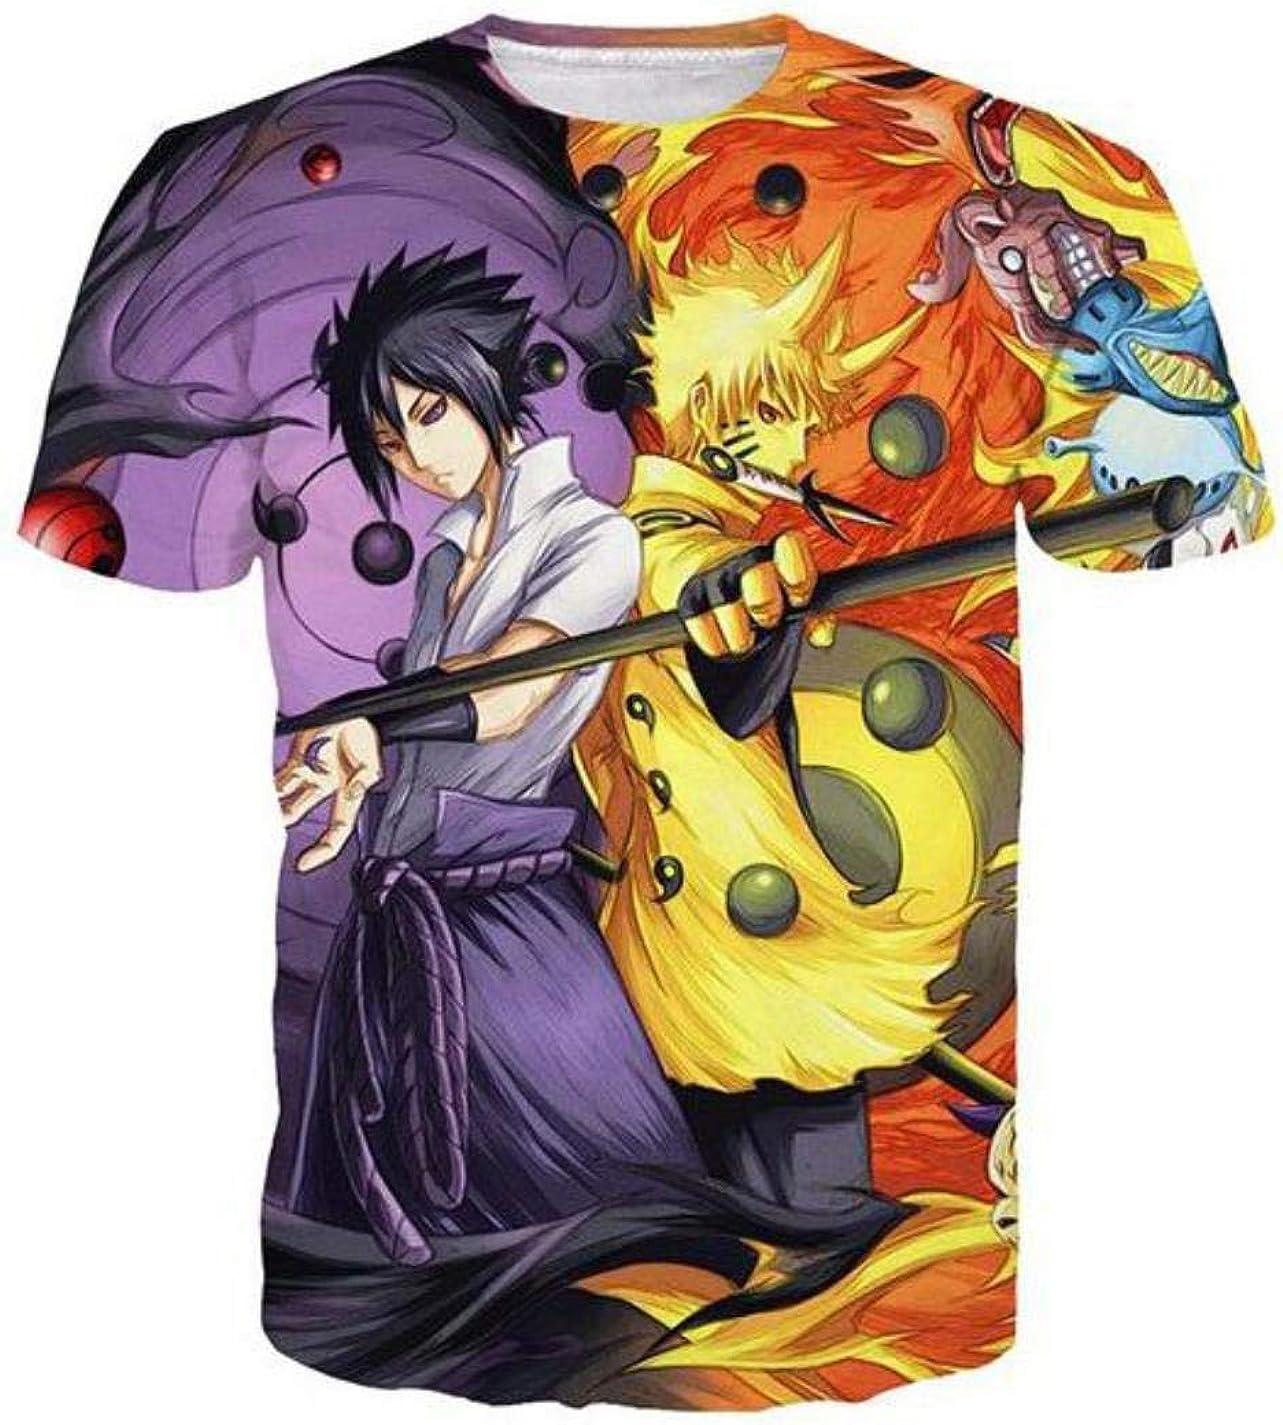 HUASON Ni/ños Naruto Camiseta 3D T-Shirt Anime de Jap/ón Camiseta Impreso con Uzumaki Unisex Uchiha Manga Corta M